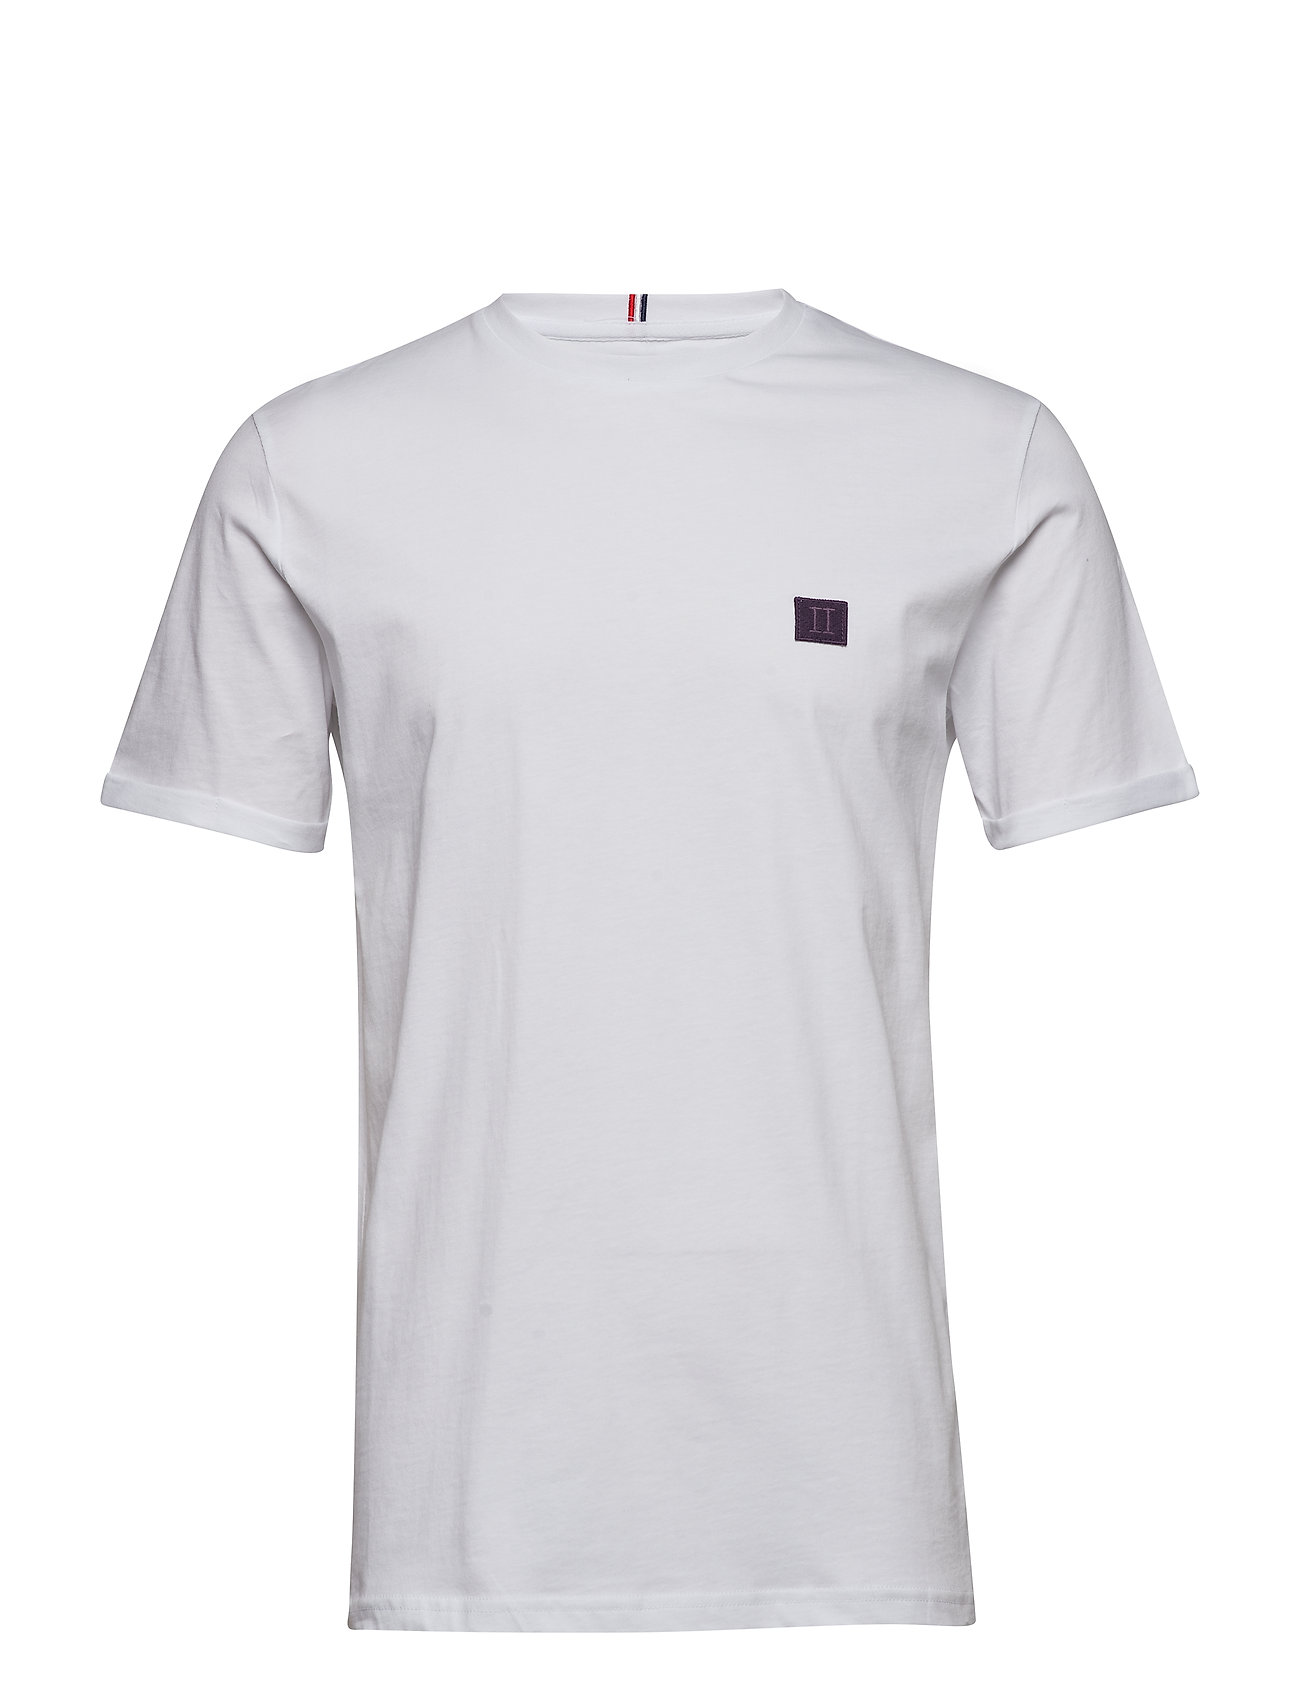 Image of Piece T-Shirt (3119382149)